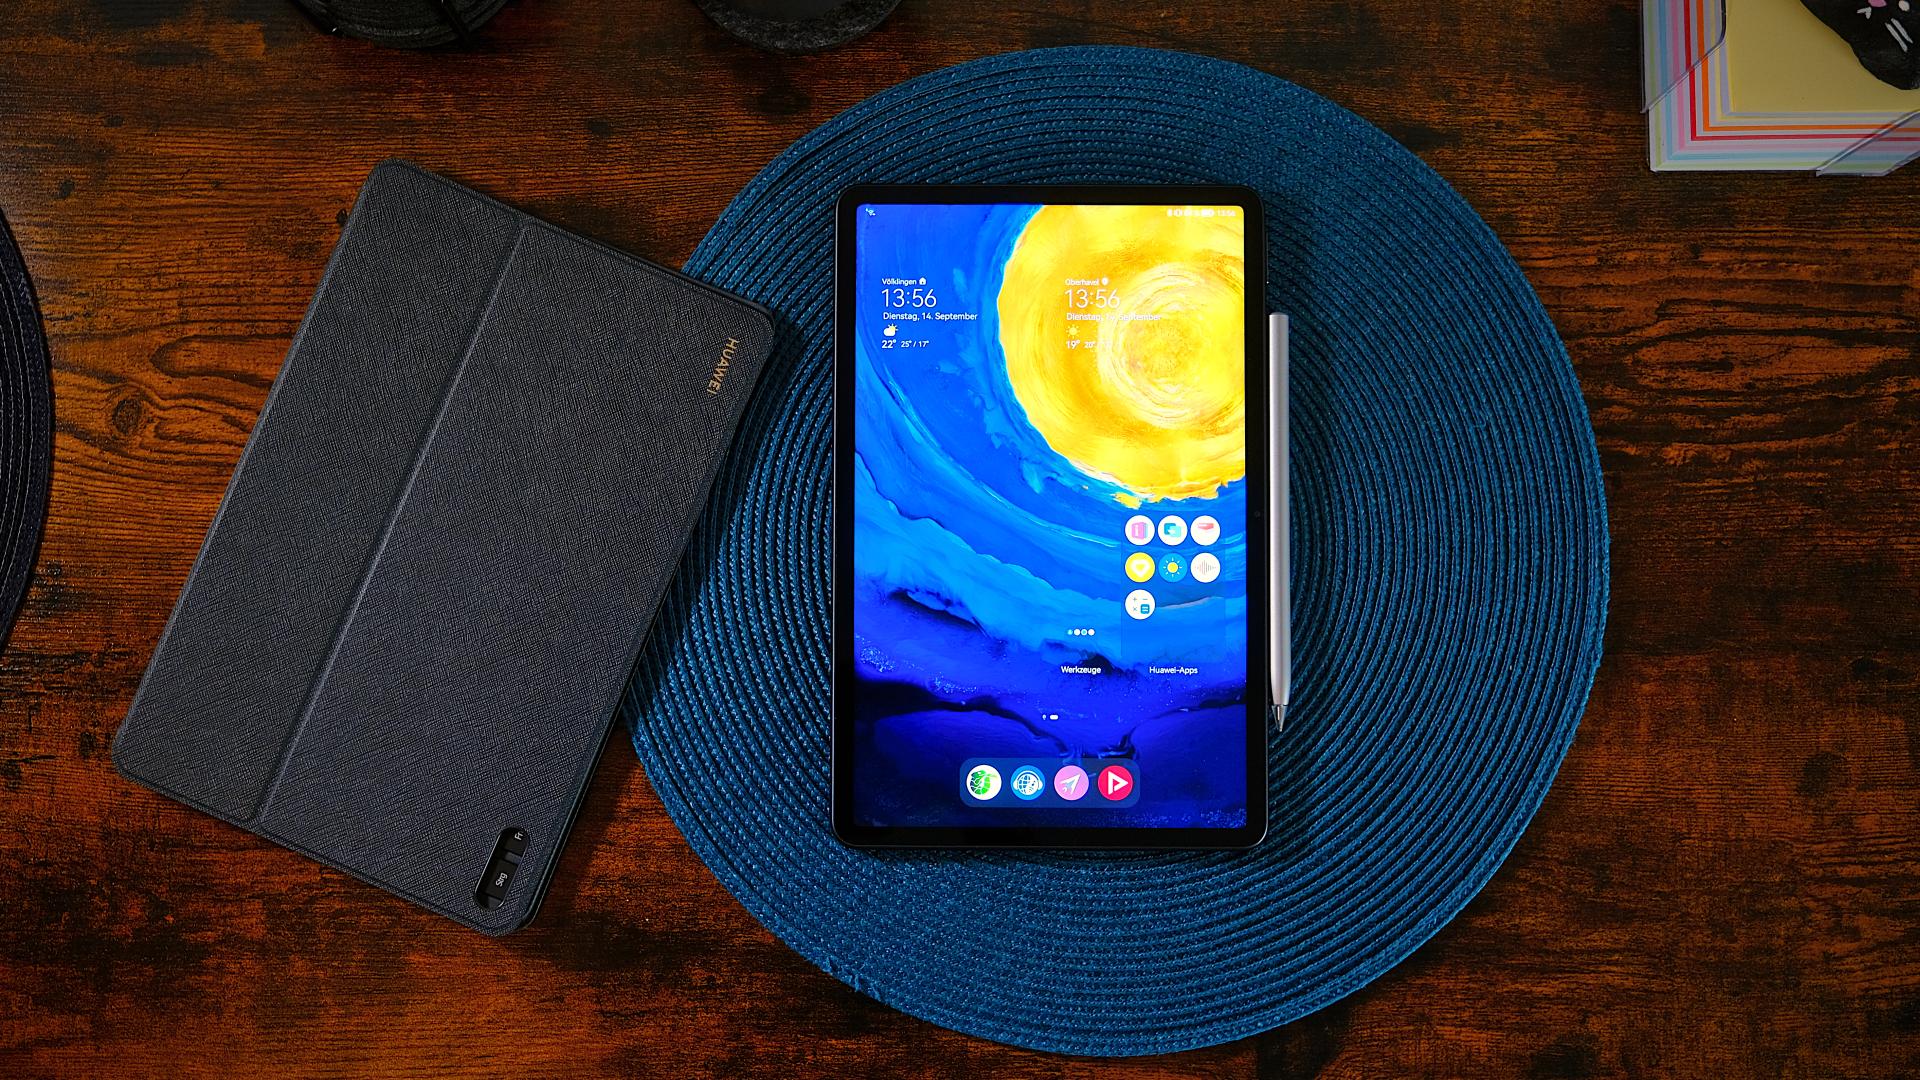 Huawei MatePad 11: Hervorragendes Medien-Tablet mit Eigenheiten